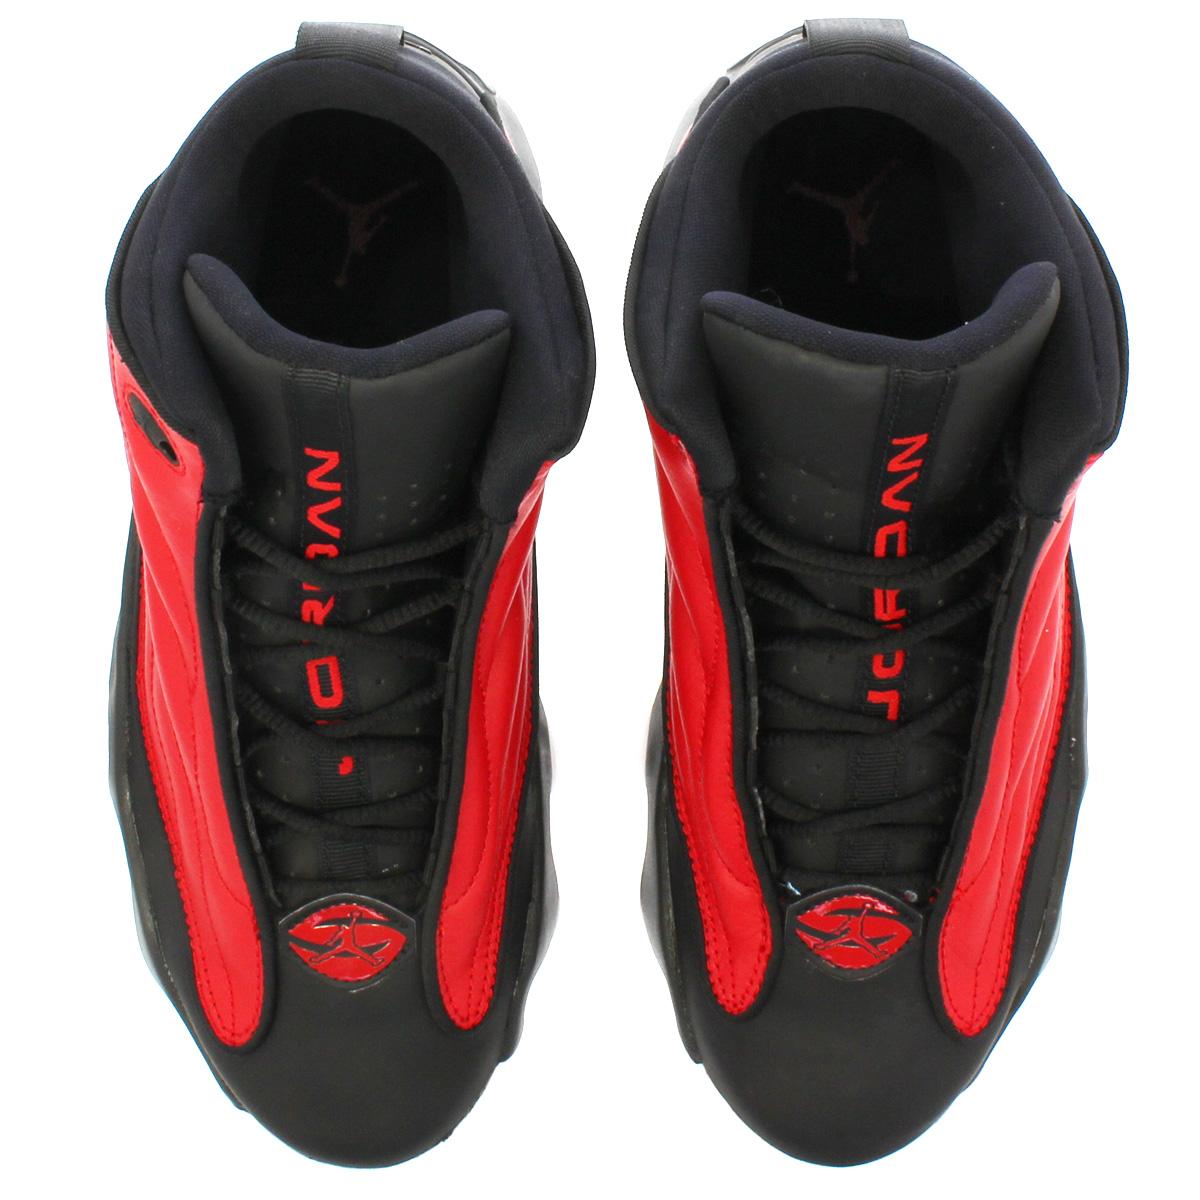 quality design 5f955 f2d3f ... NIKE JORDAN PRO STRONG GS Nike Nike Jordan Prost long GS GYM  REDBLACKWHITE  Air ...